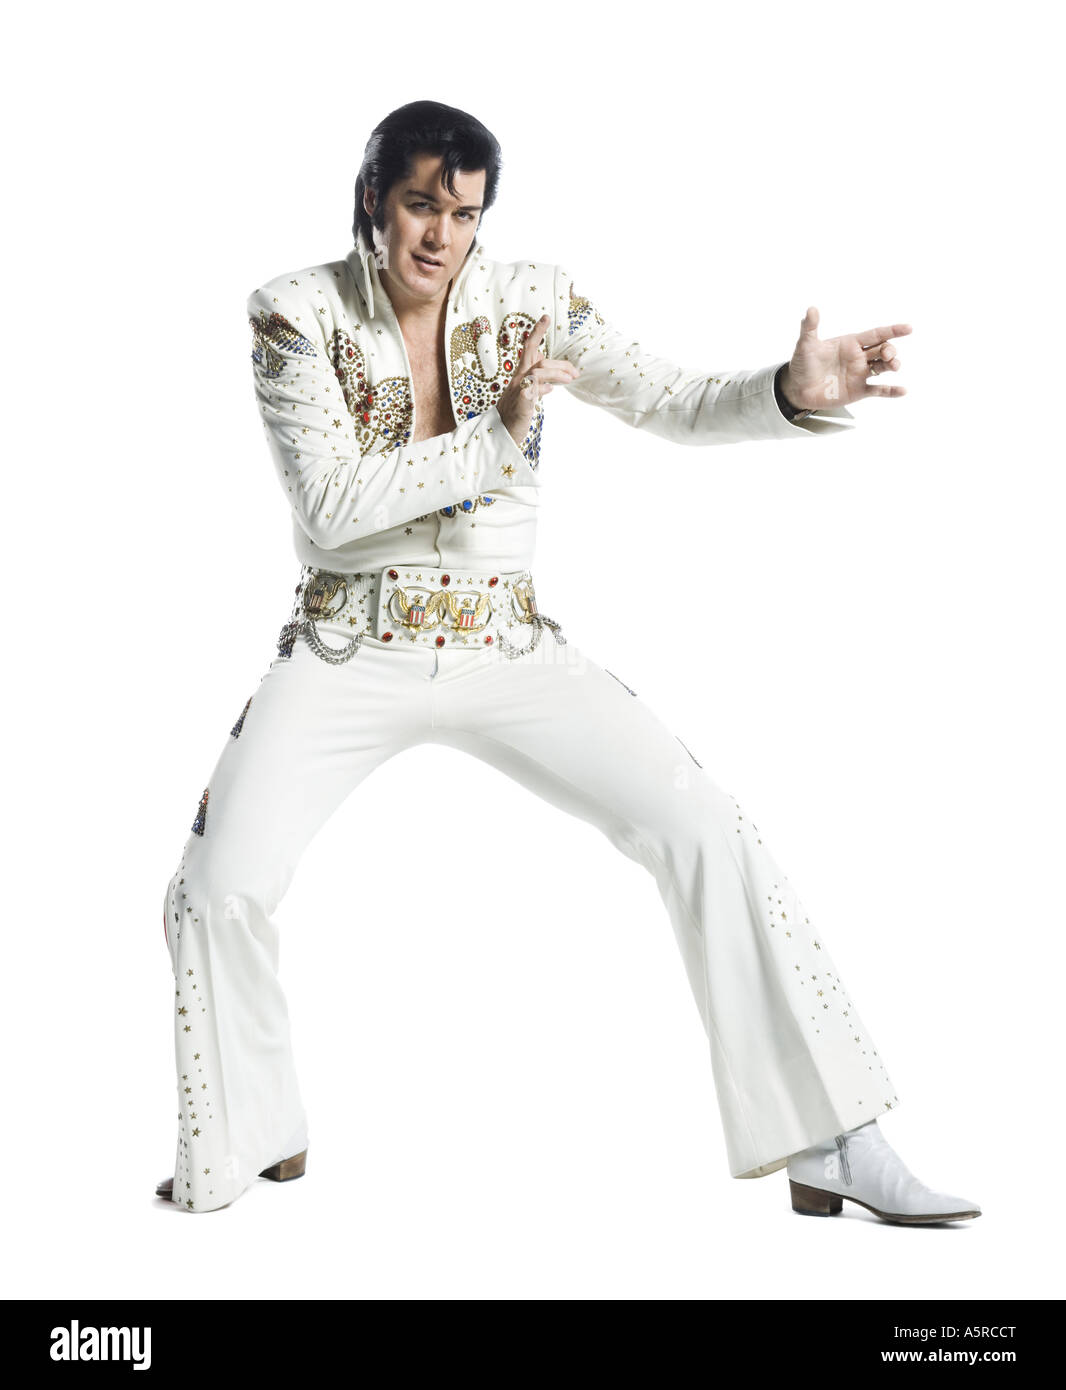 An Elvis impersonator dancing Stock Photo: 11372183 - Alamy